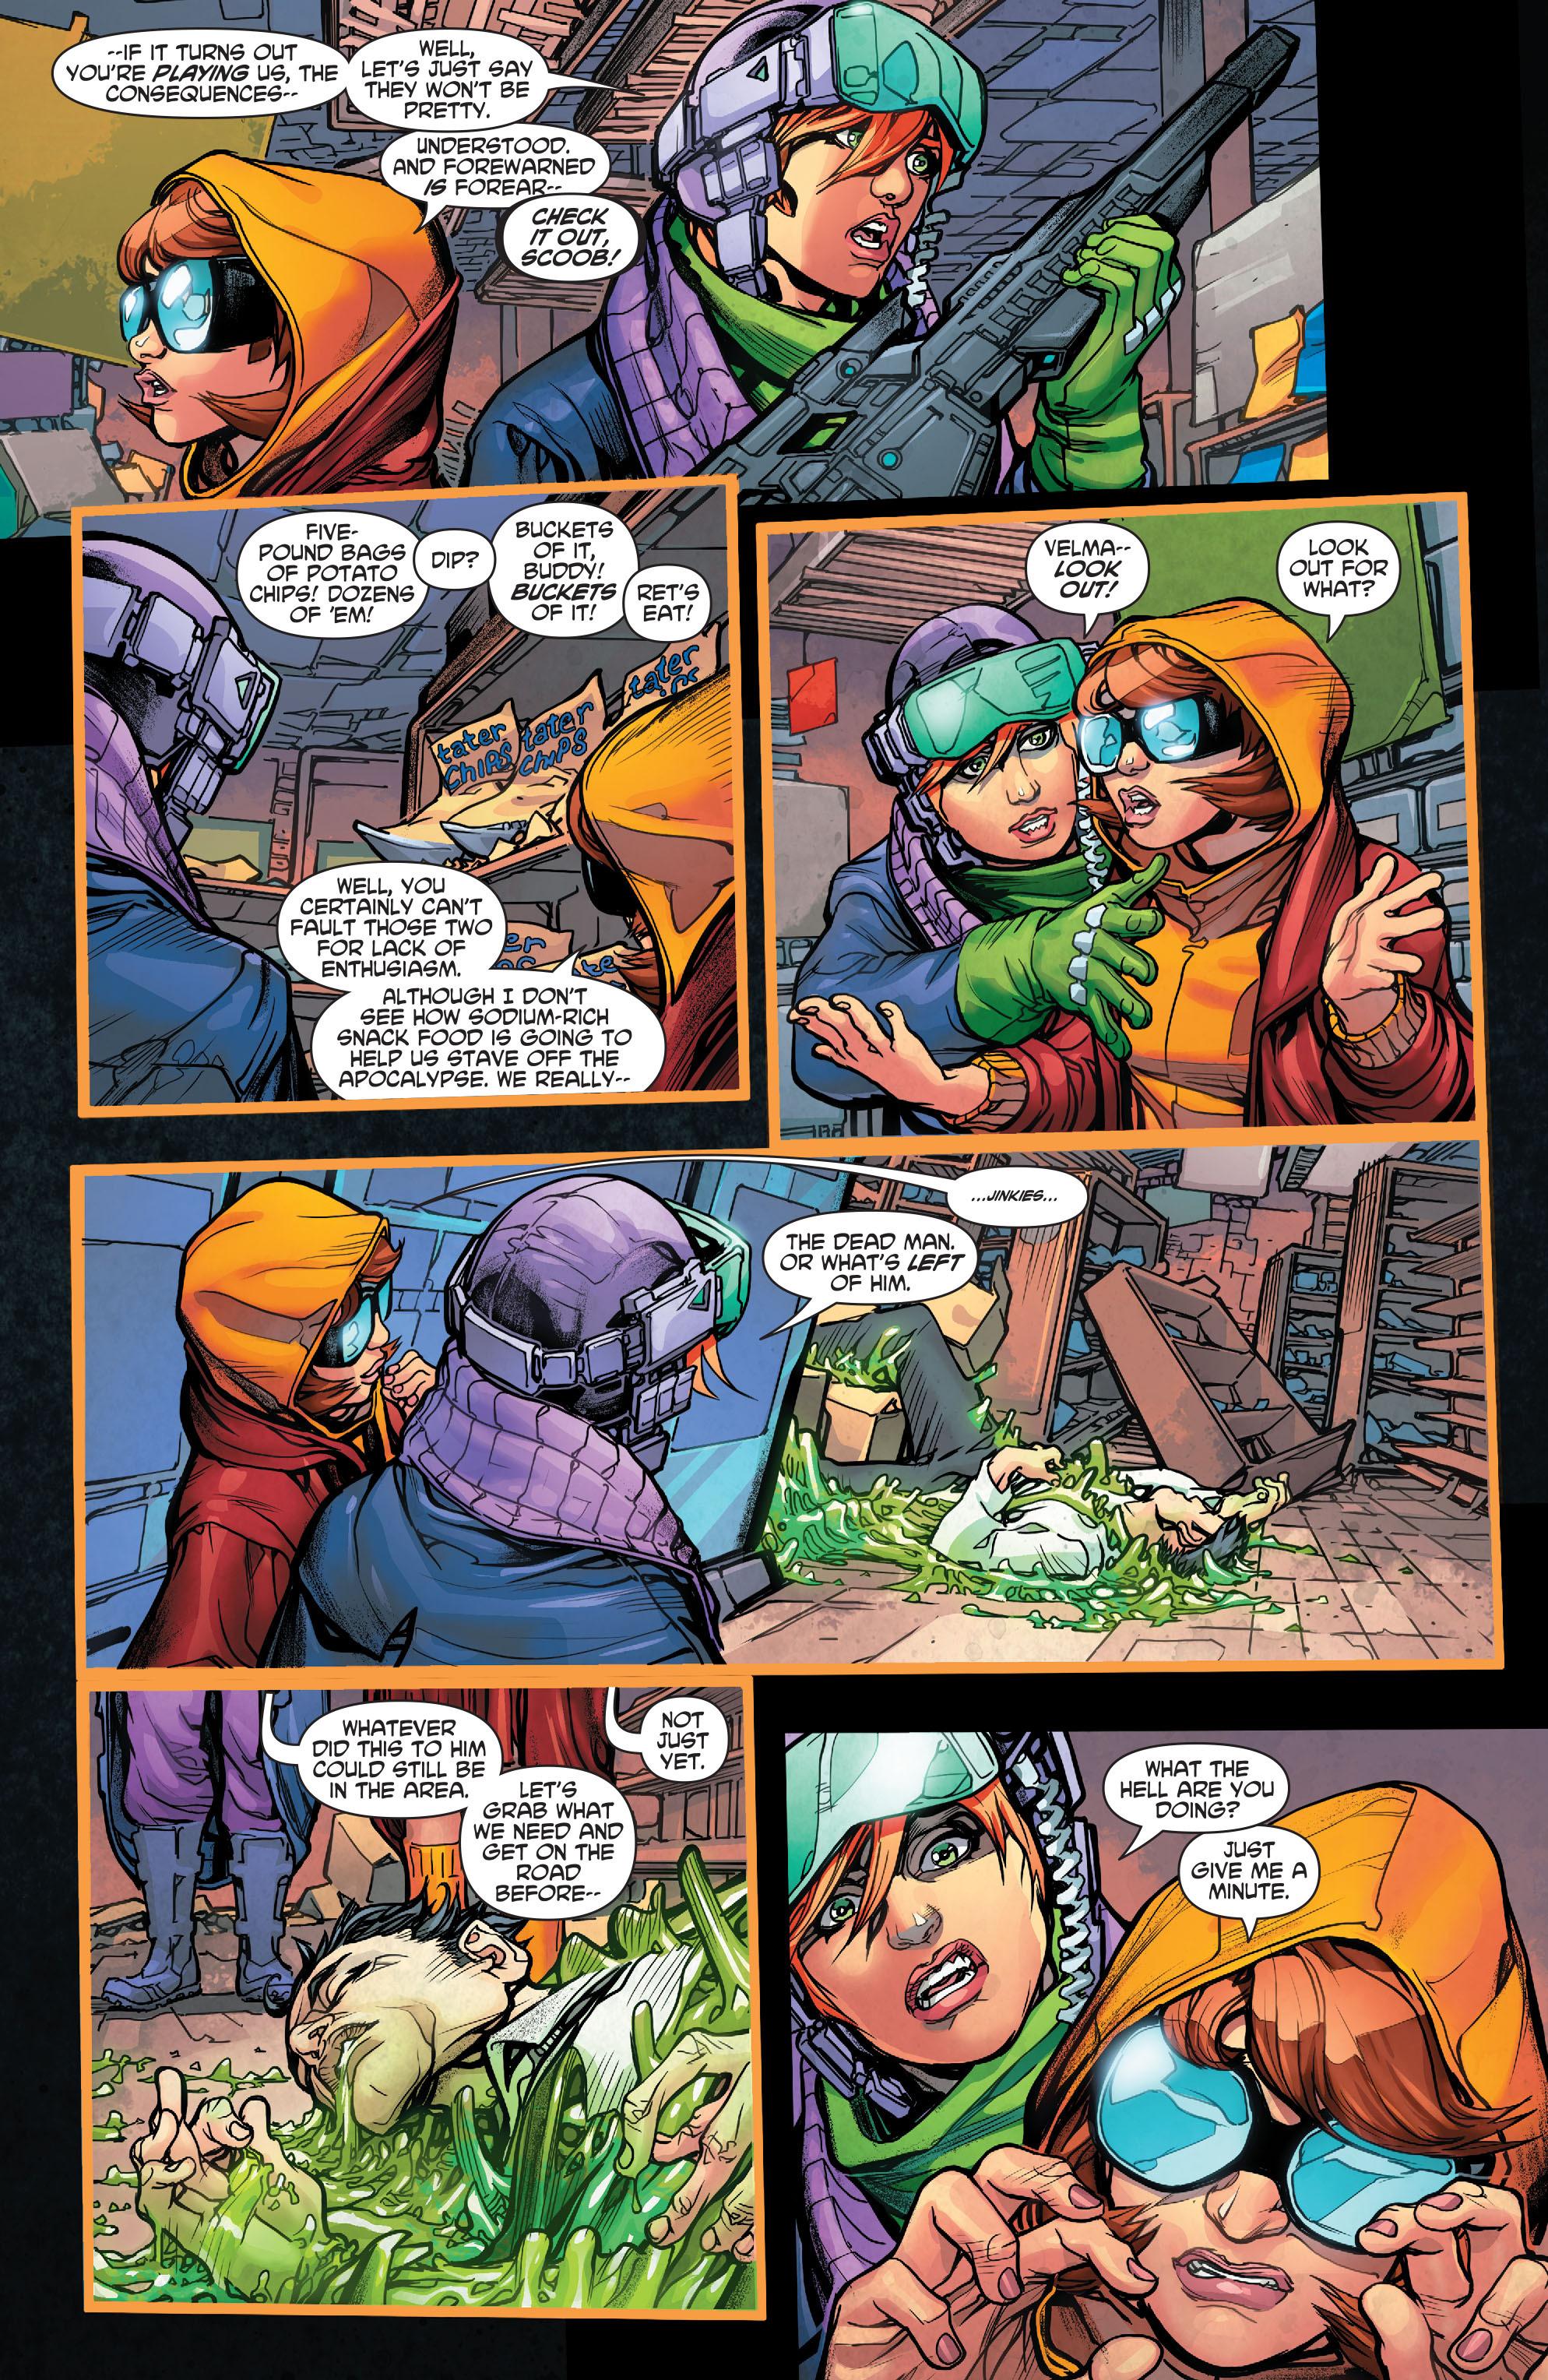 Read online Scooby Apocalypse comic -  Issue #4 - 22